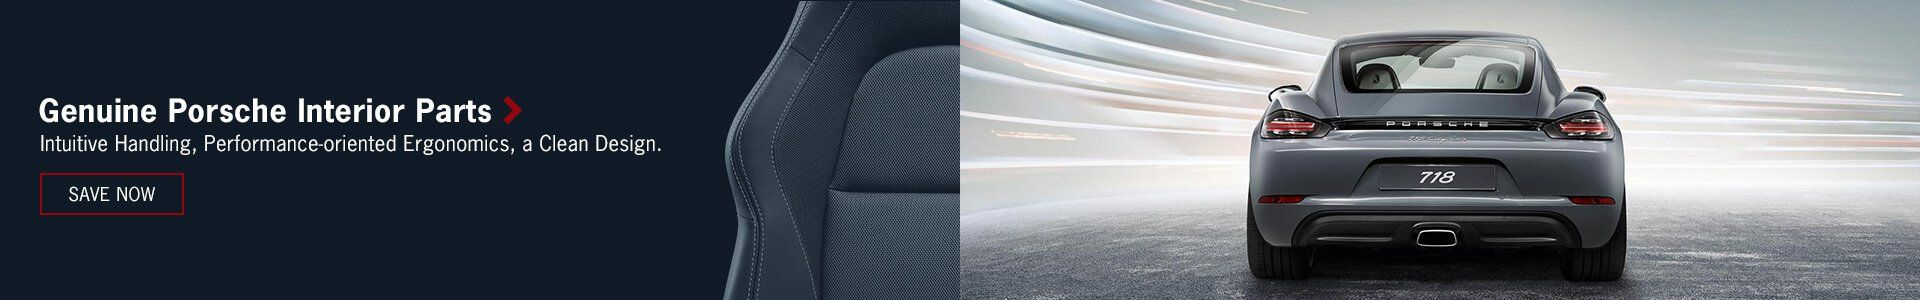 Genuine Porsche Interior Parts and Accessories